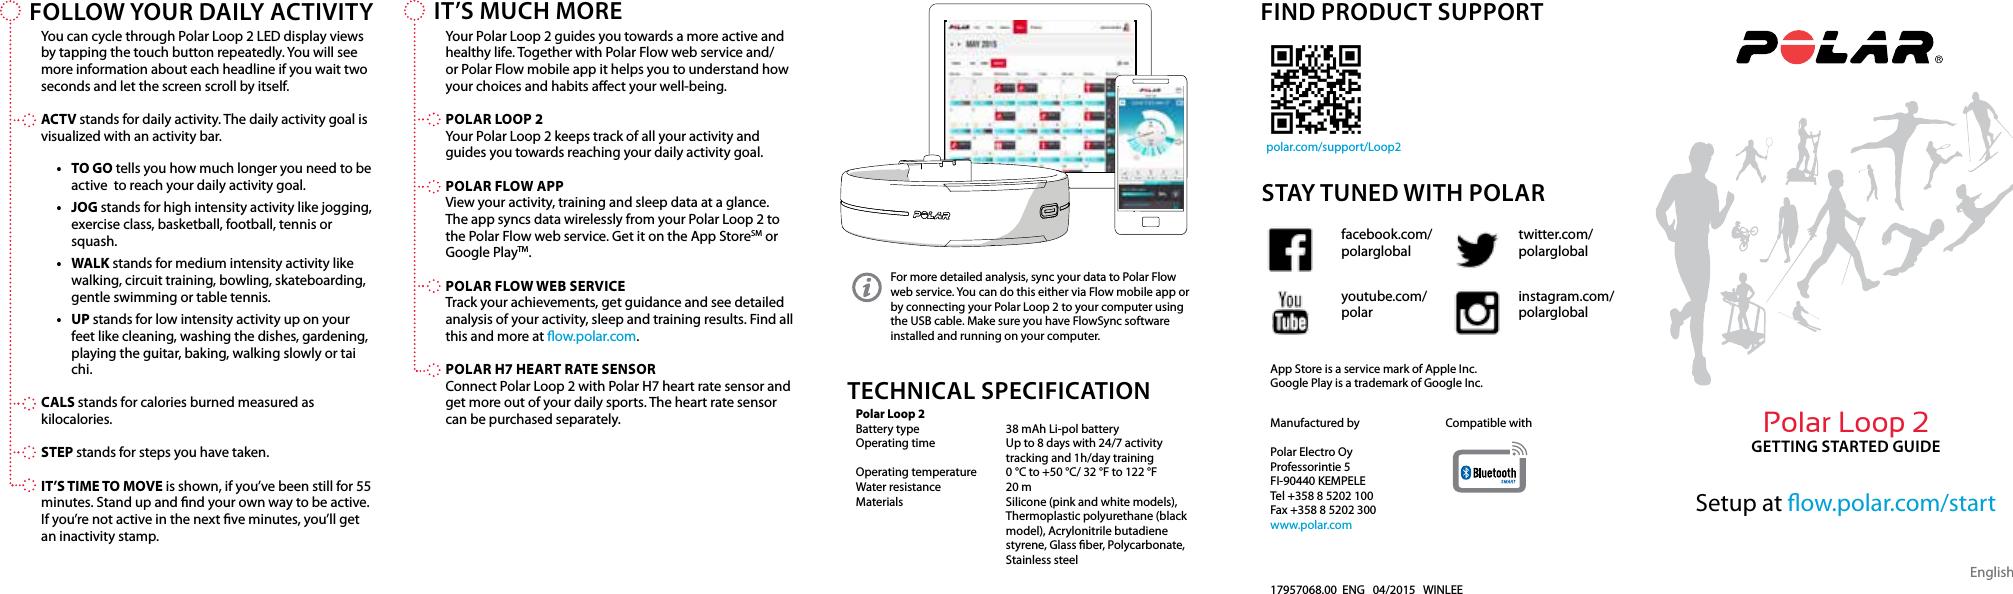 Polar Electro 1E Low Energy BT Wrist Worn Heart Rate Monitor